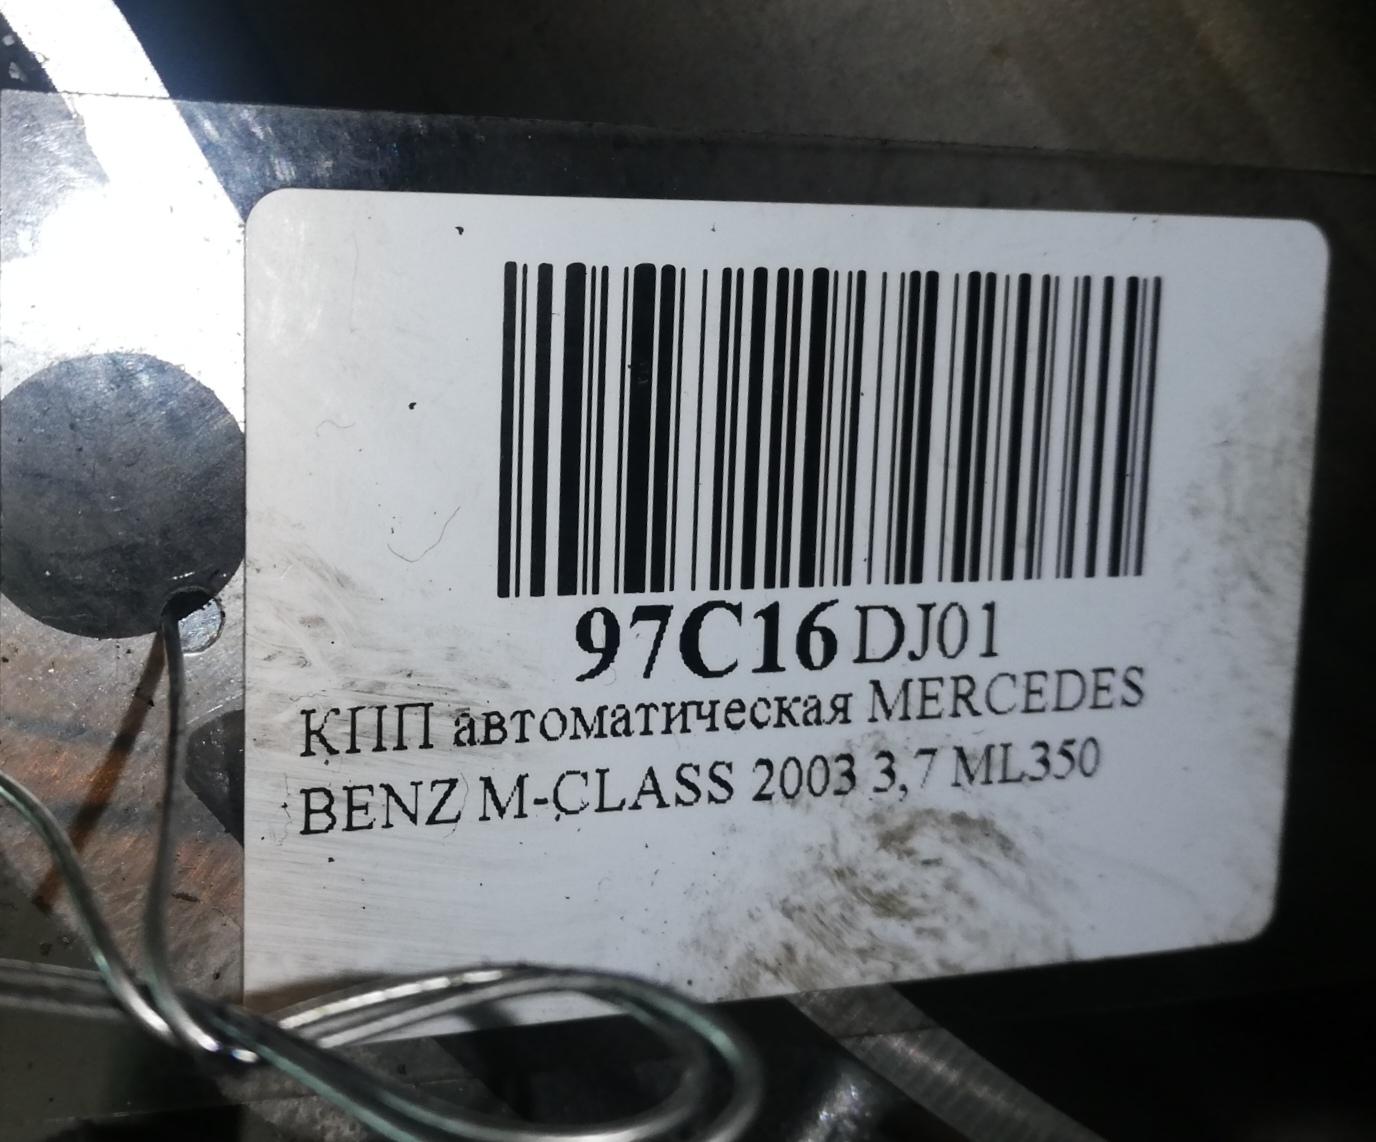 КПП автоматическая, MERCEDES BENZ, M-CLASS W163, 2003